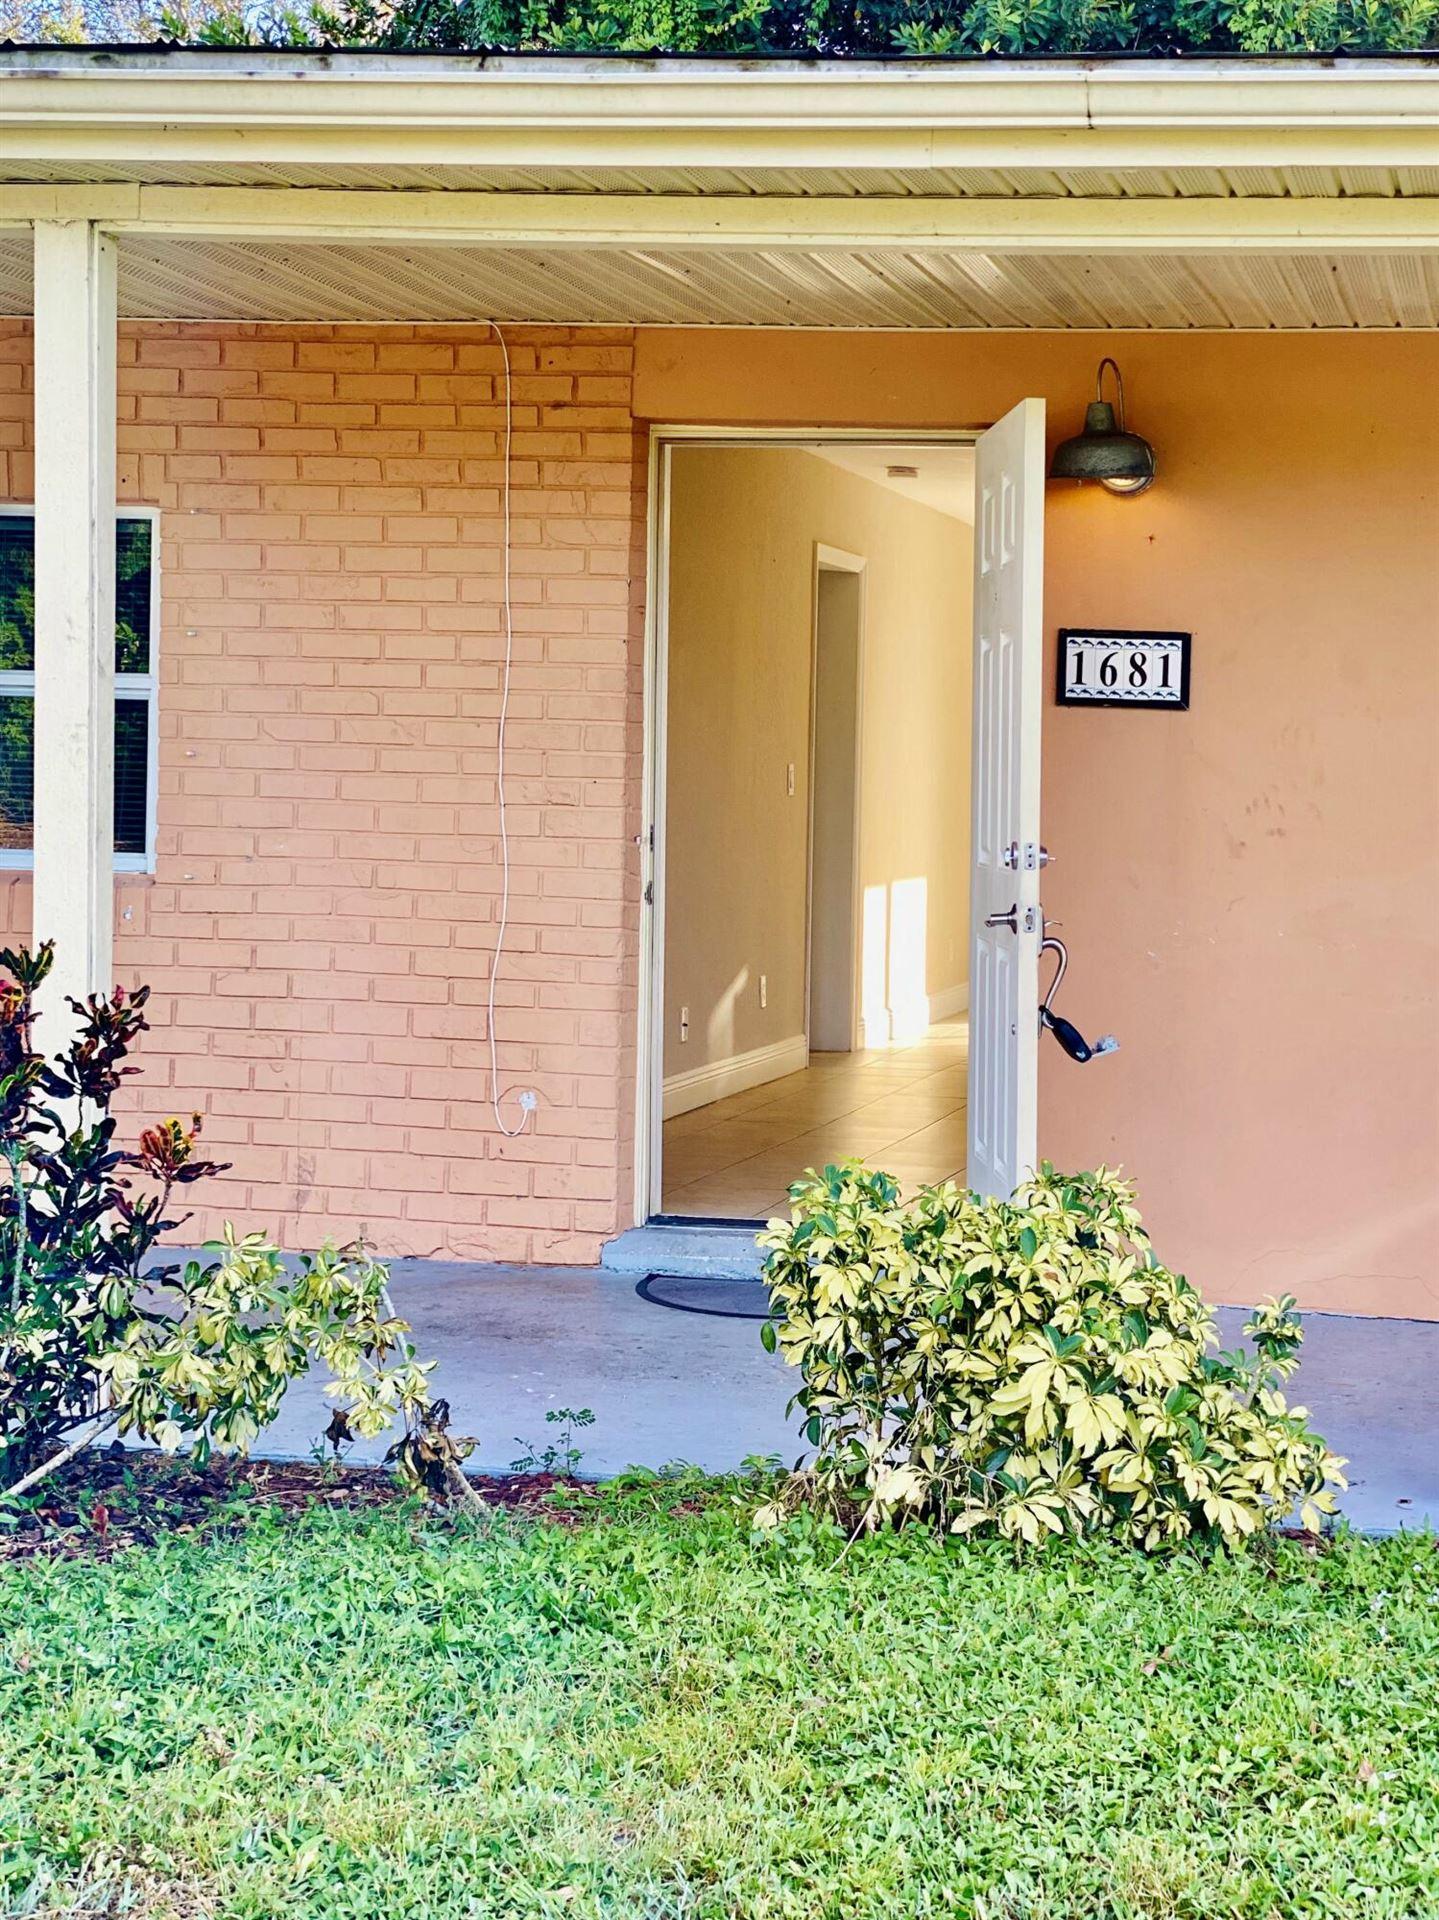 Photo of 1681 NW Palm Lake Drive, Stuart, FL 34994 (MLS # RX-10753830)